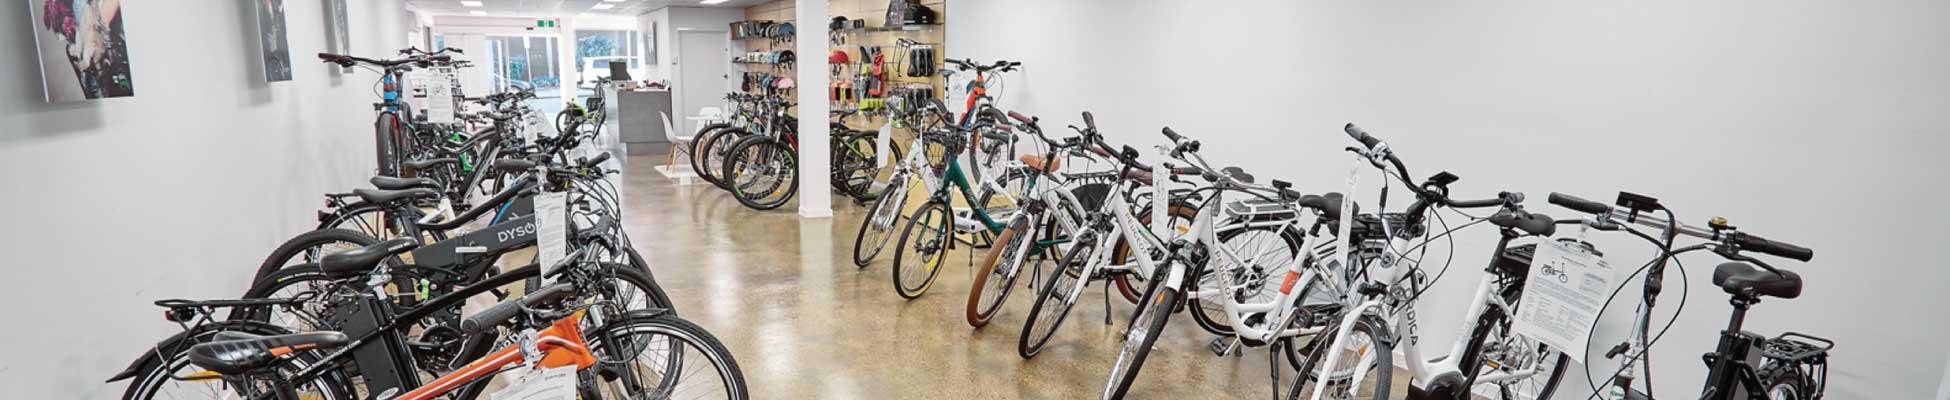 Ebike Hire Brisbane - Milton Store